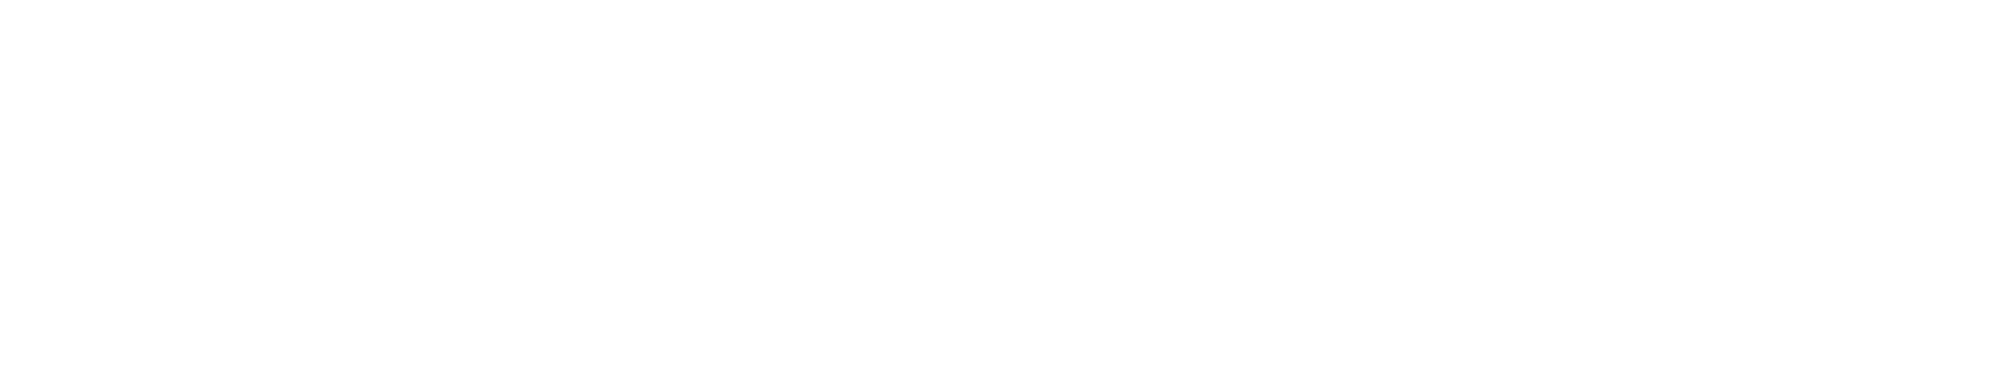 Soccer Academy - Soccer Program | IMG Academy 2019